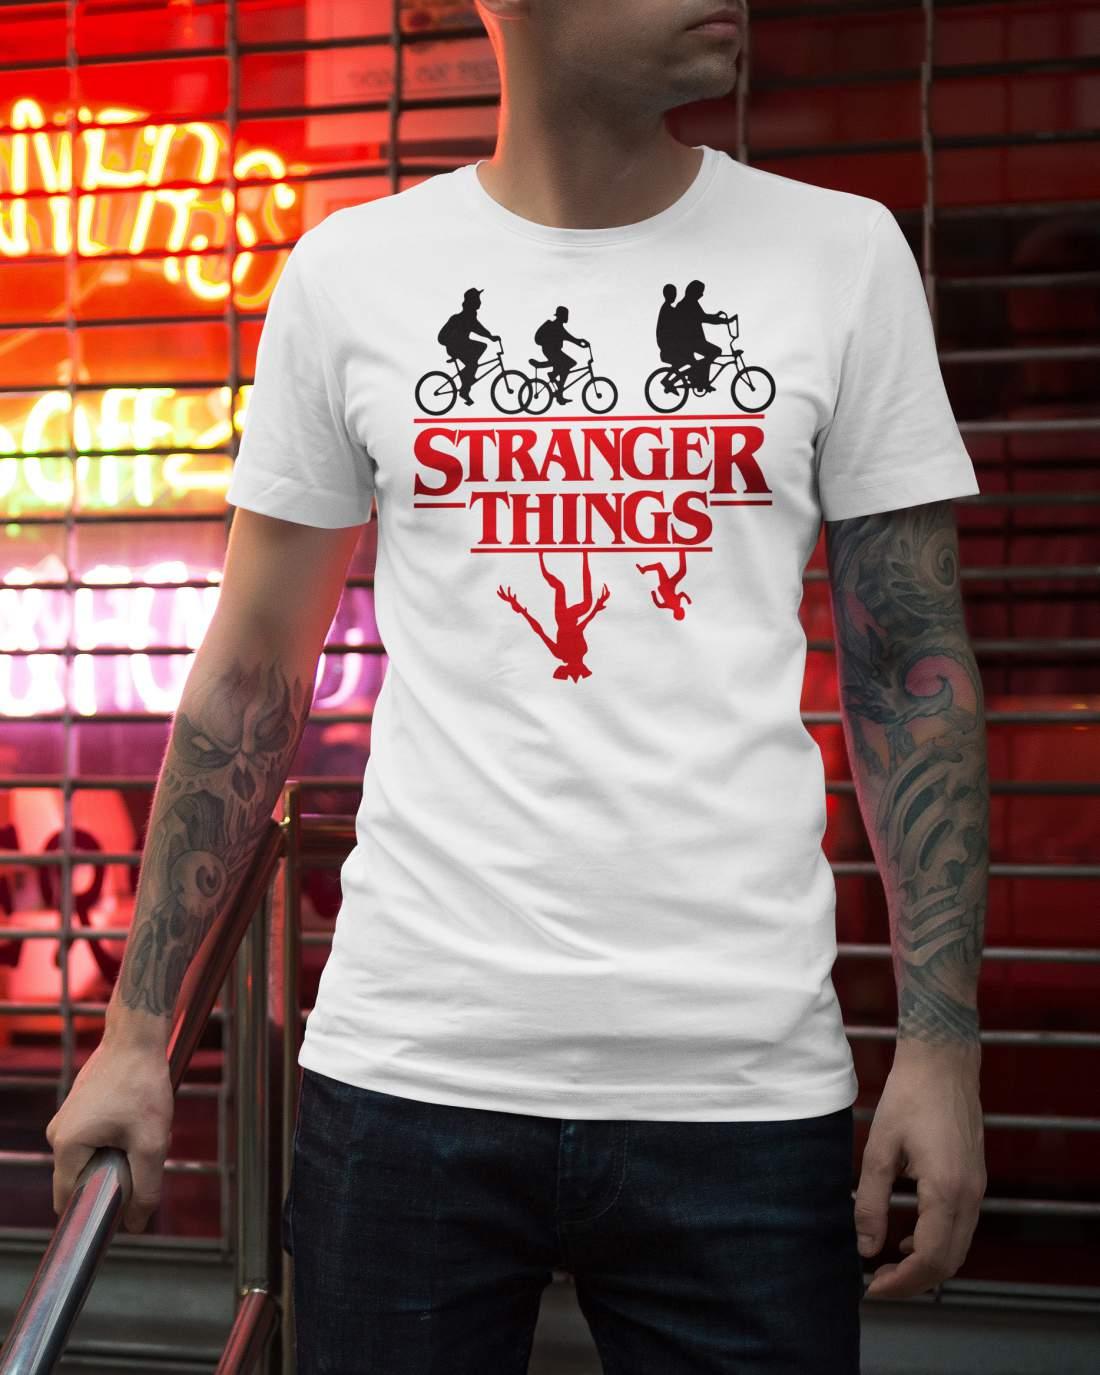 Stranger Things 2 férfi póló fehér